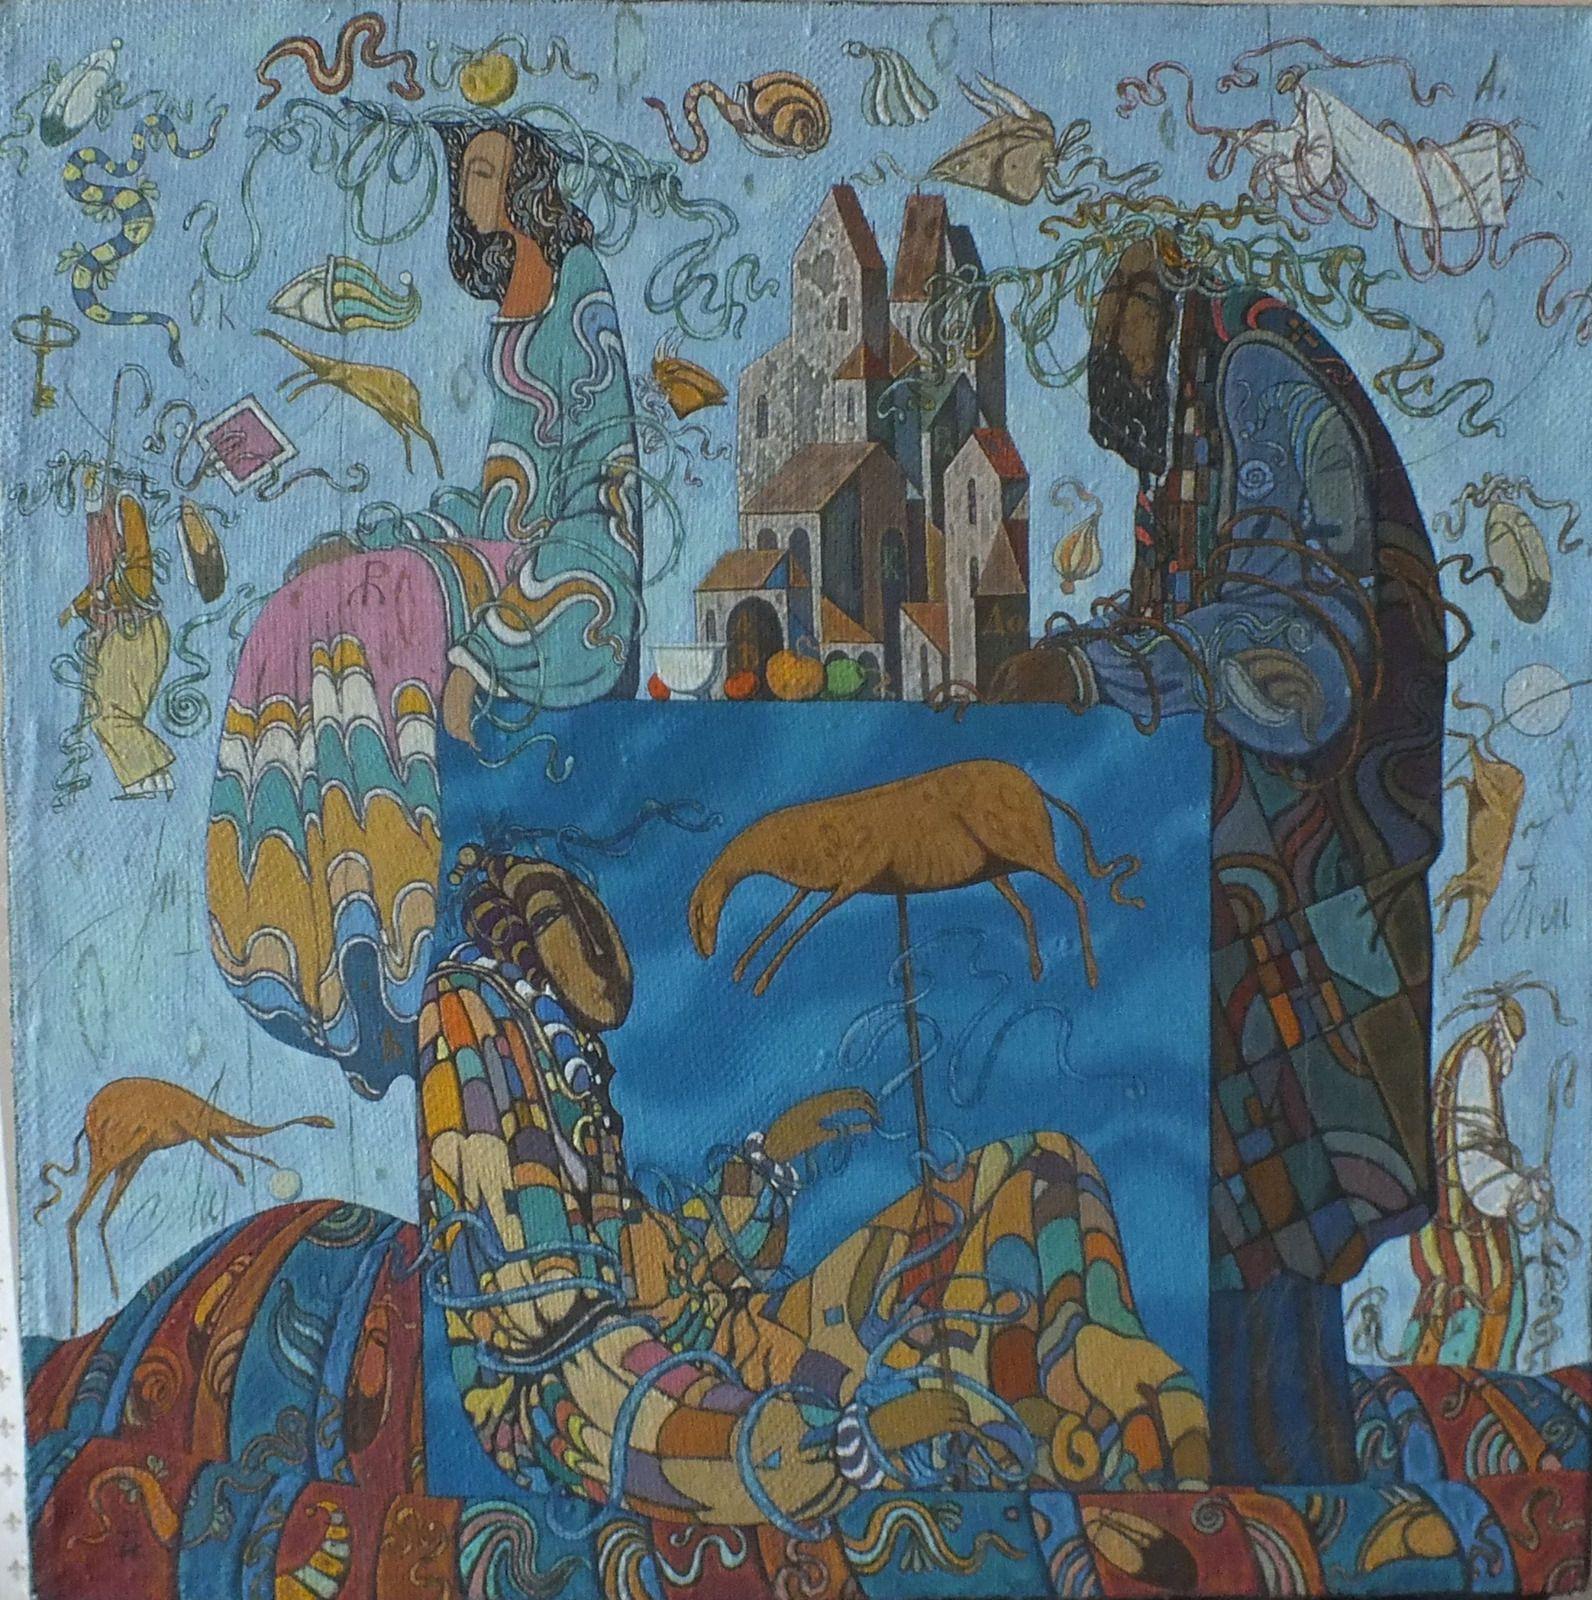 "Ölgemälde Ölbild Leinwand Surrealismus signiert Igor Topilin,,Die Schwermut"" | eBay"